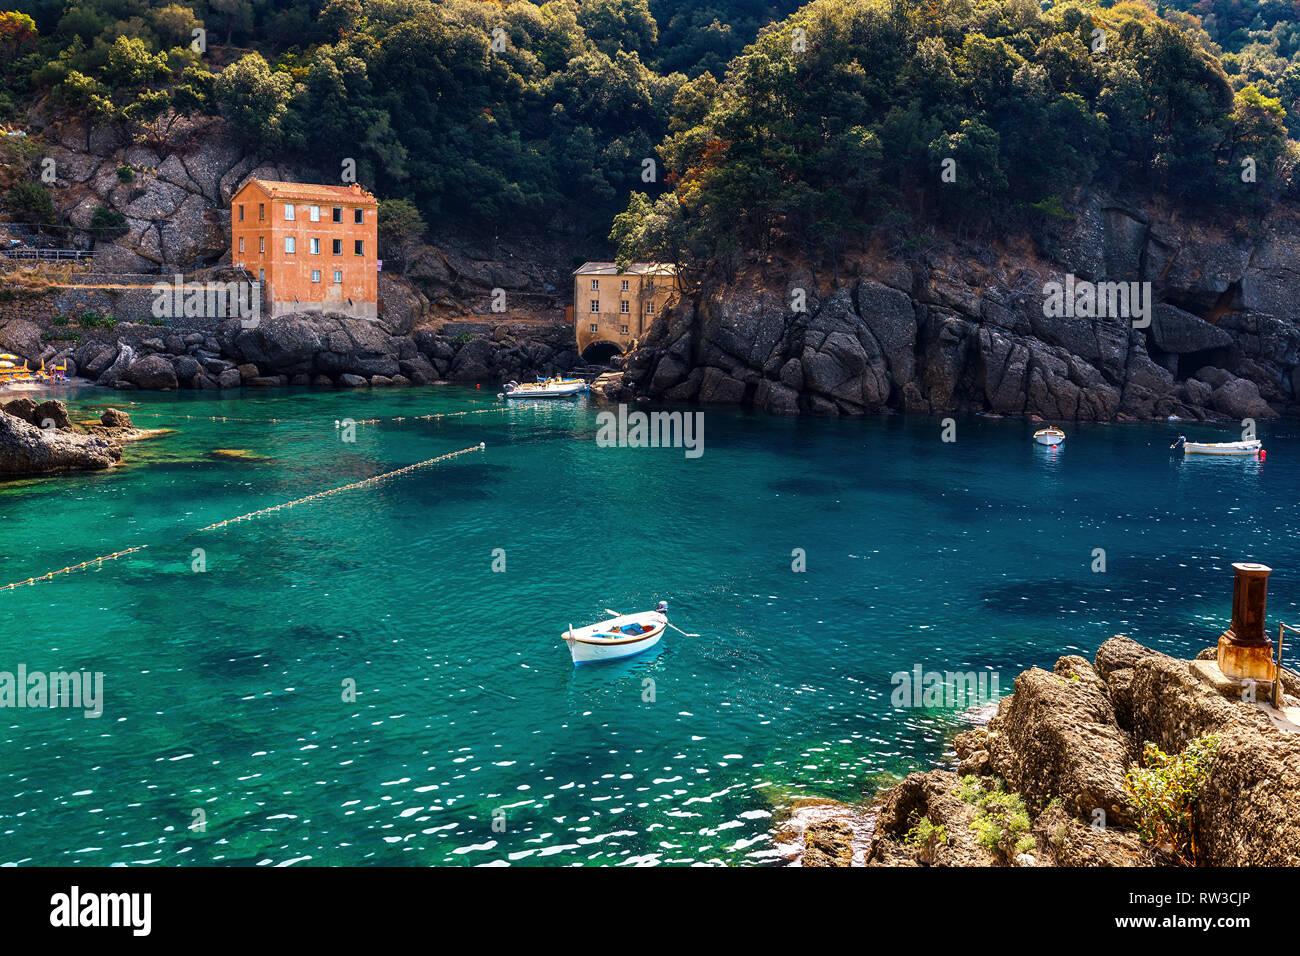 Small bay among rocks at San Fruttuoso, Liguria, Italy. - Stock Image